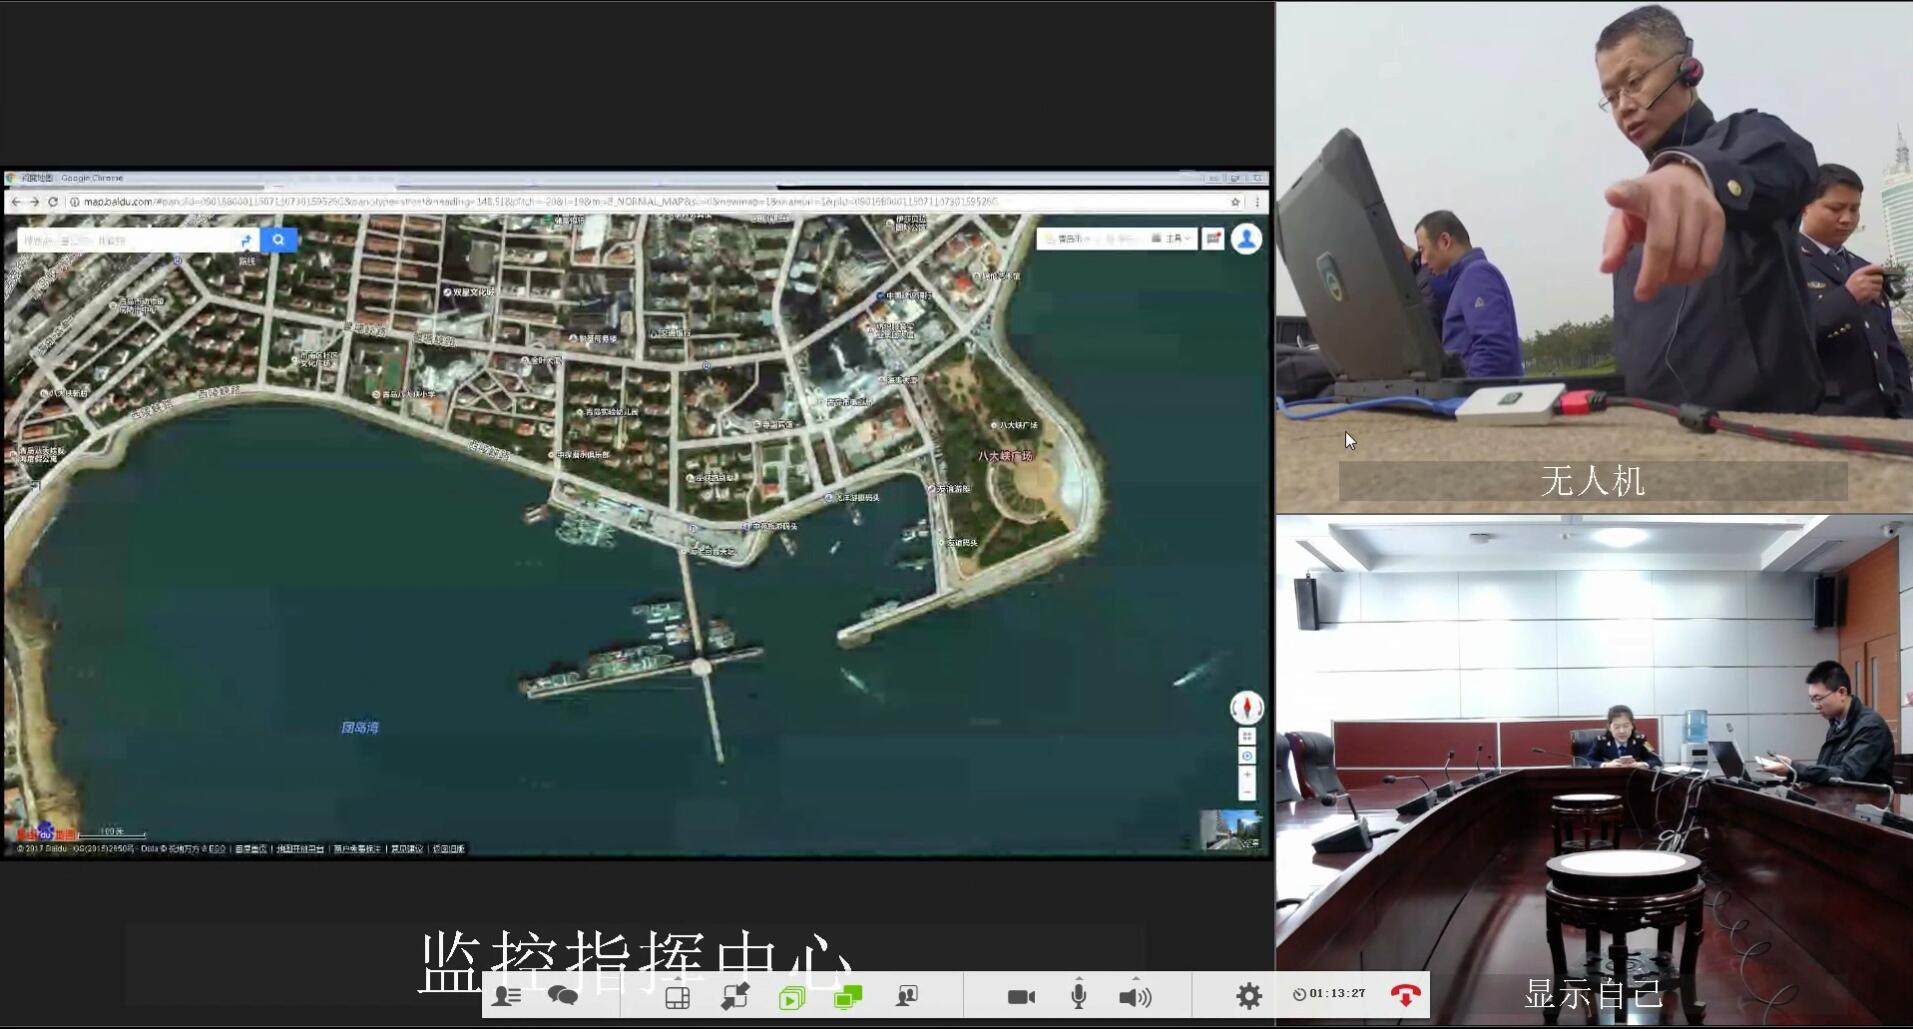 4G移动视频通讯应急指挥系统.jpg